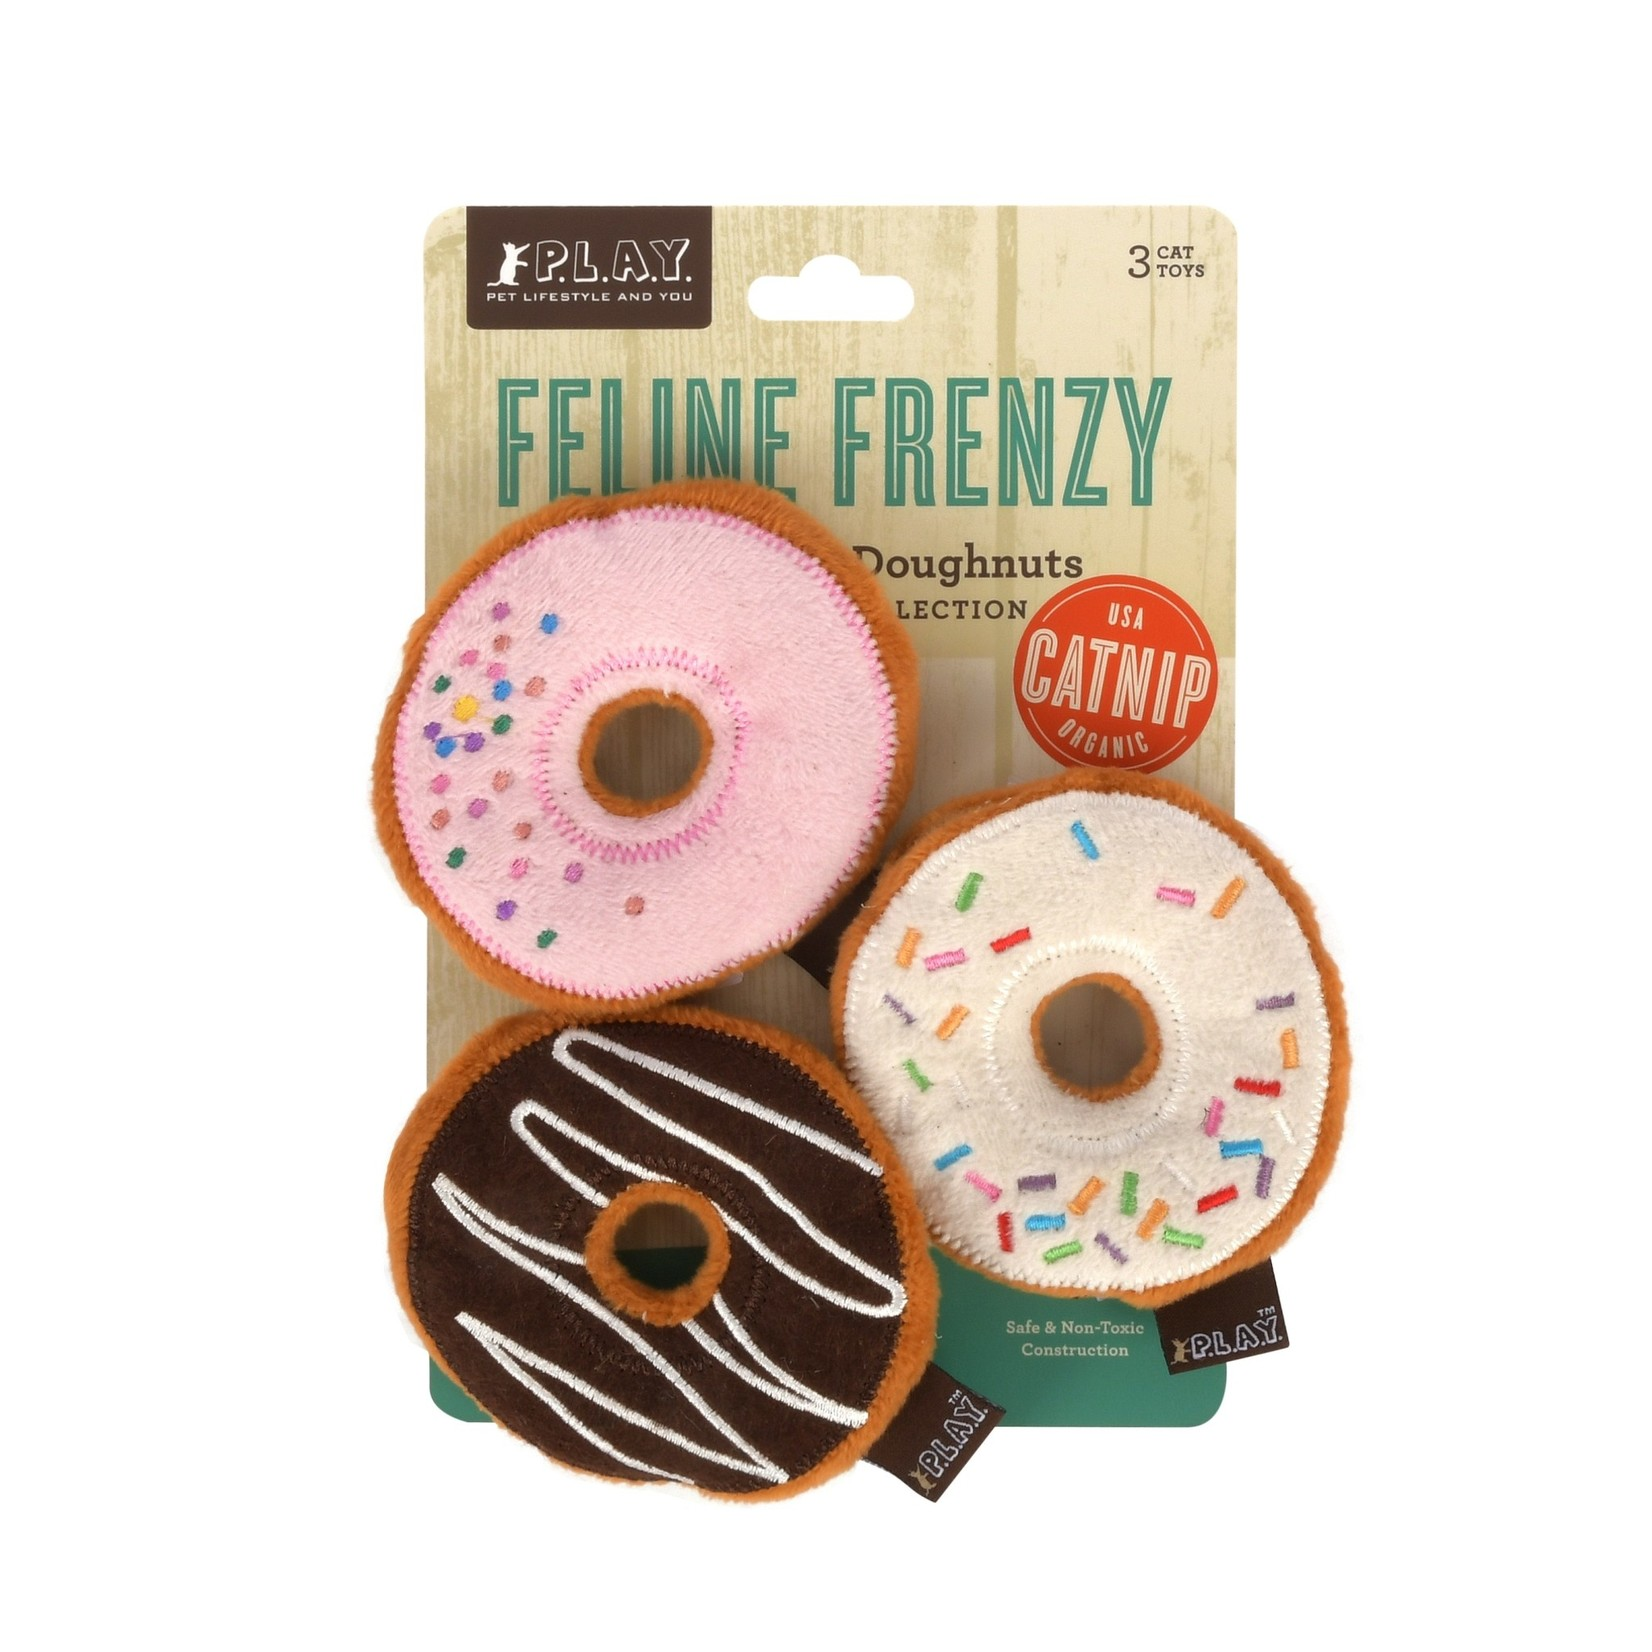 PLAY PLAY Feline Frenzy_Kitty Kreme Doughnuts